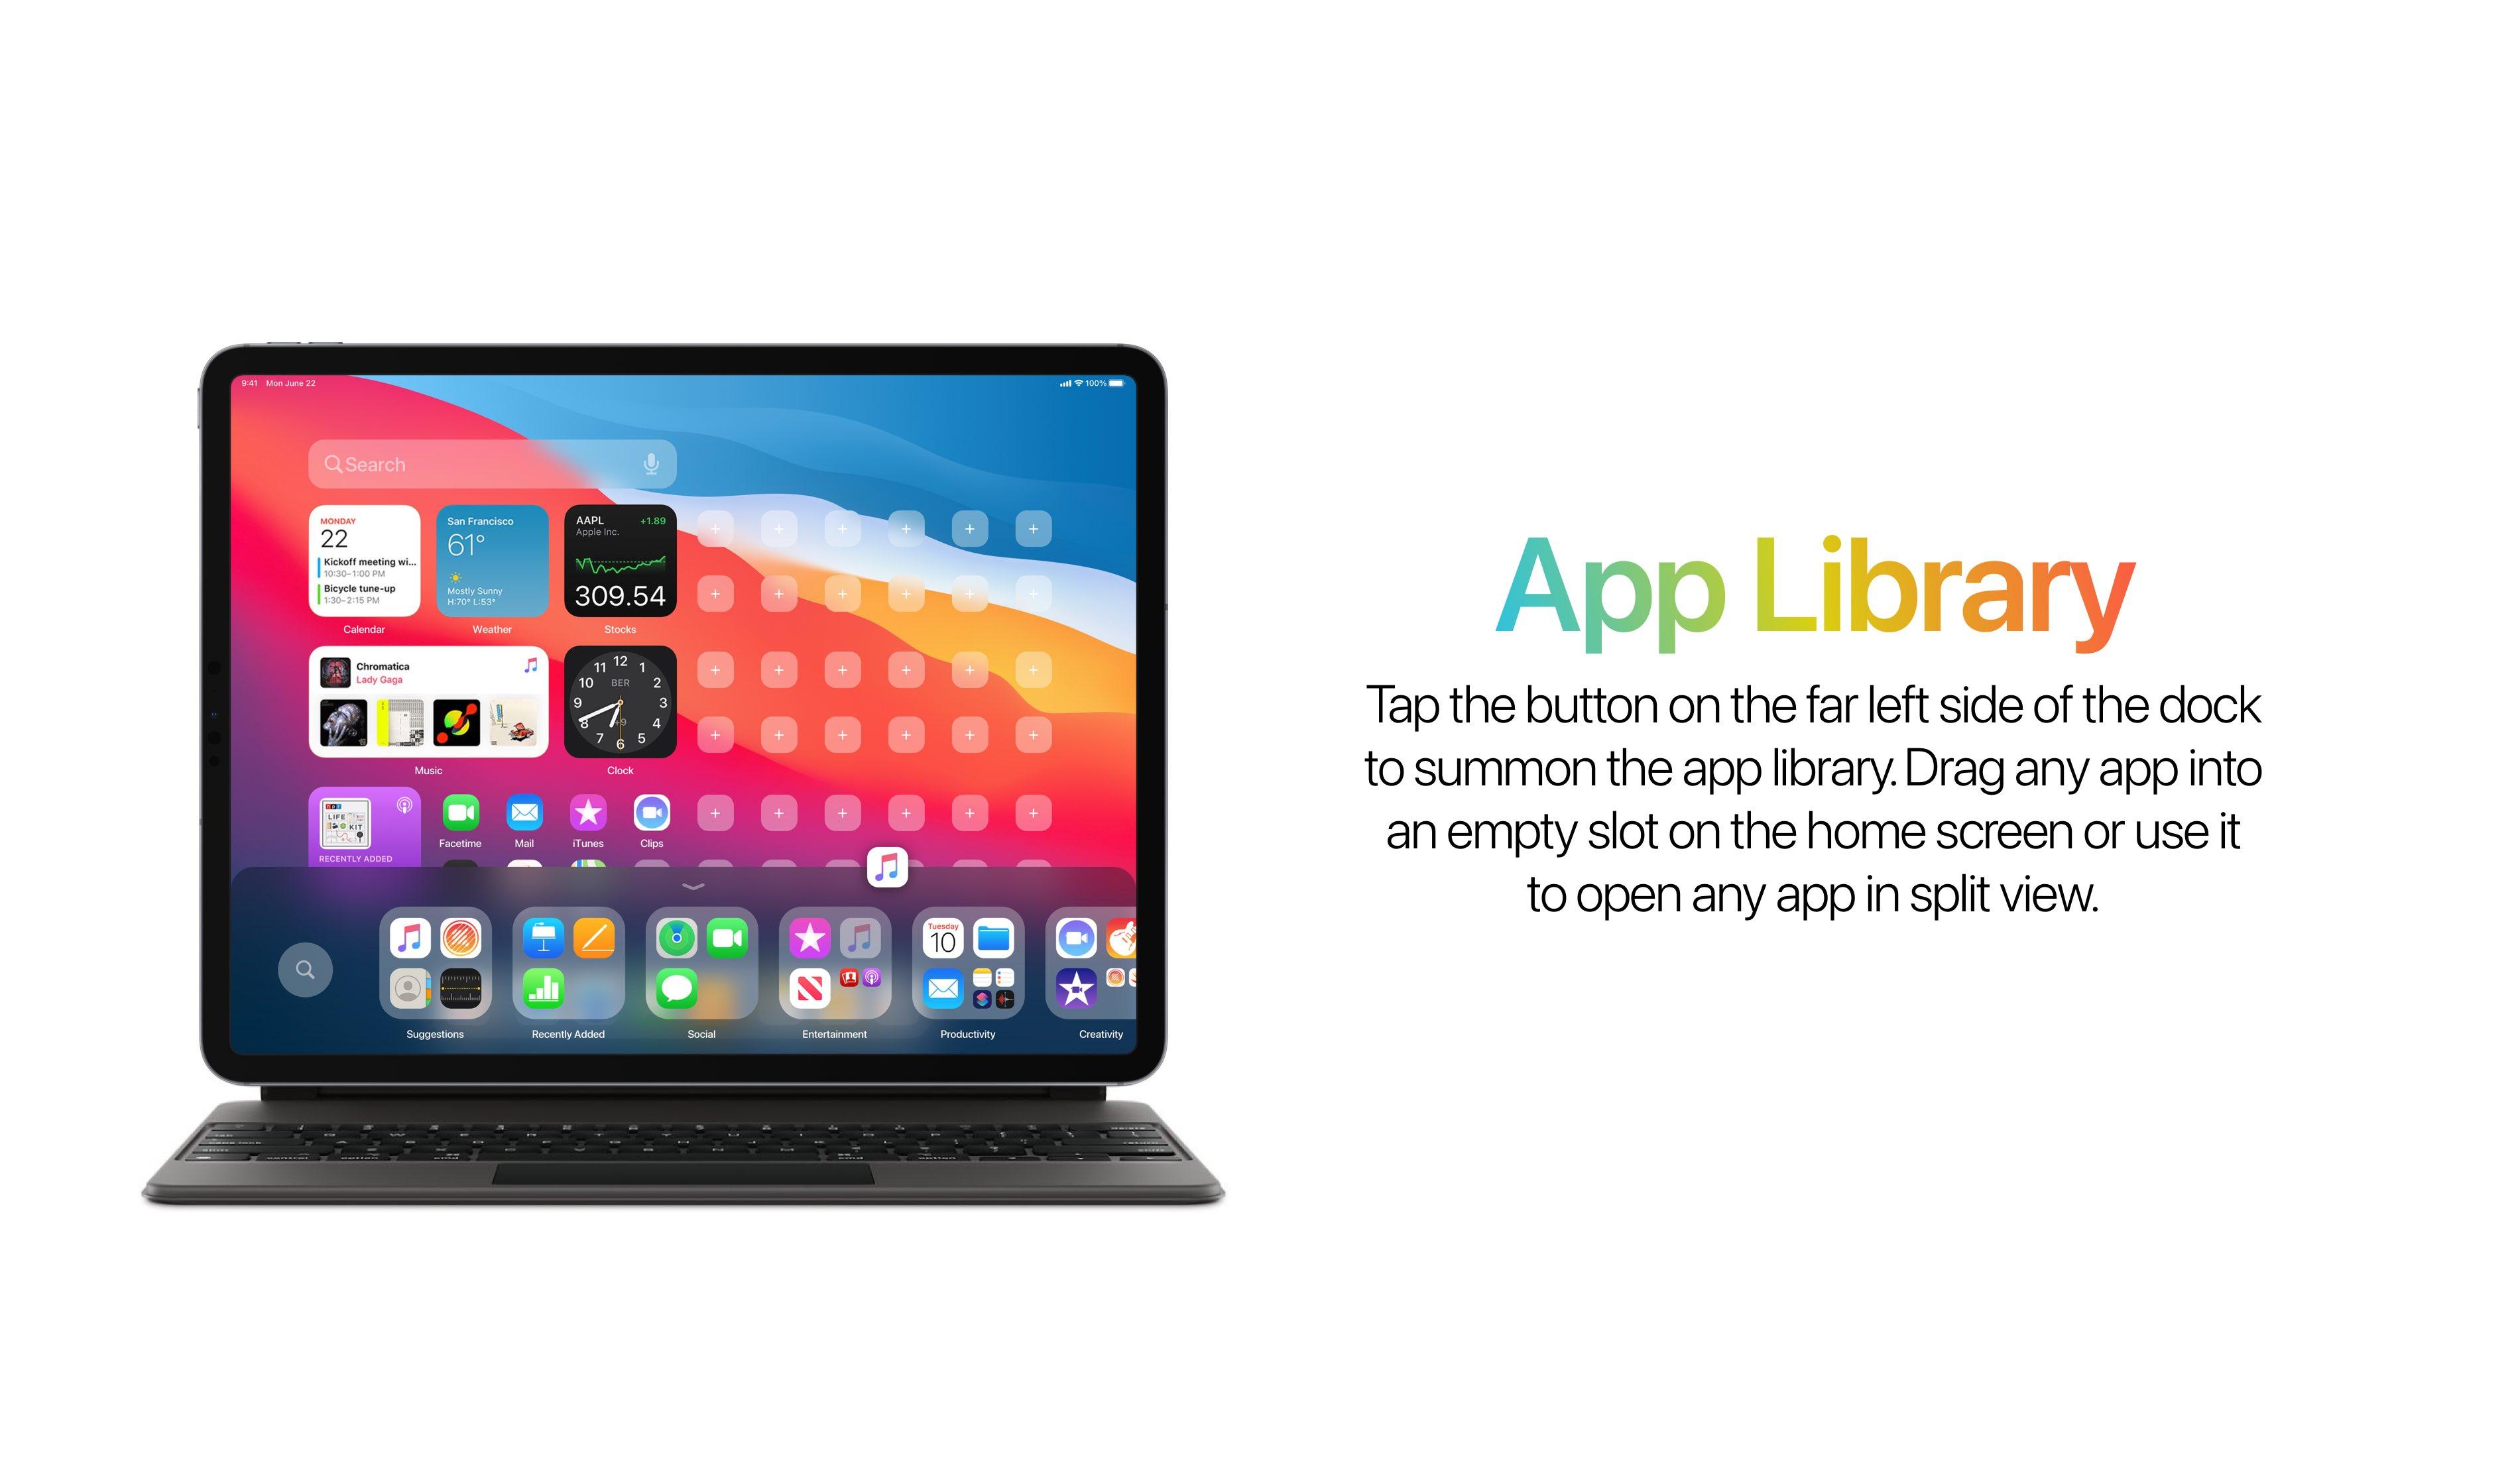 iPadOS 15 iPadOS 14 aktualizacja Apple koncept widżety